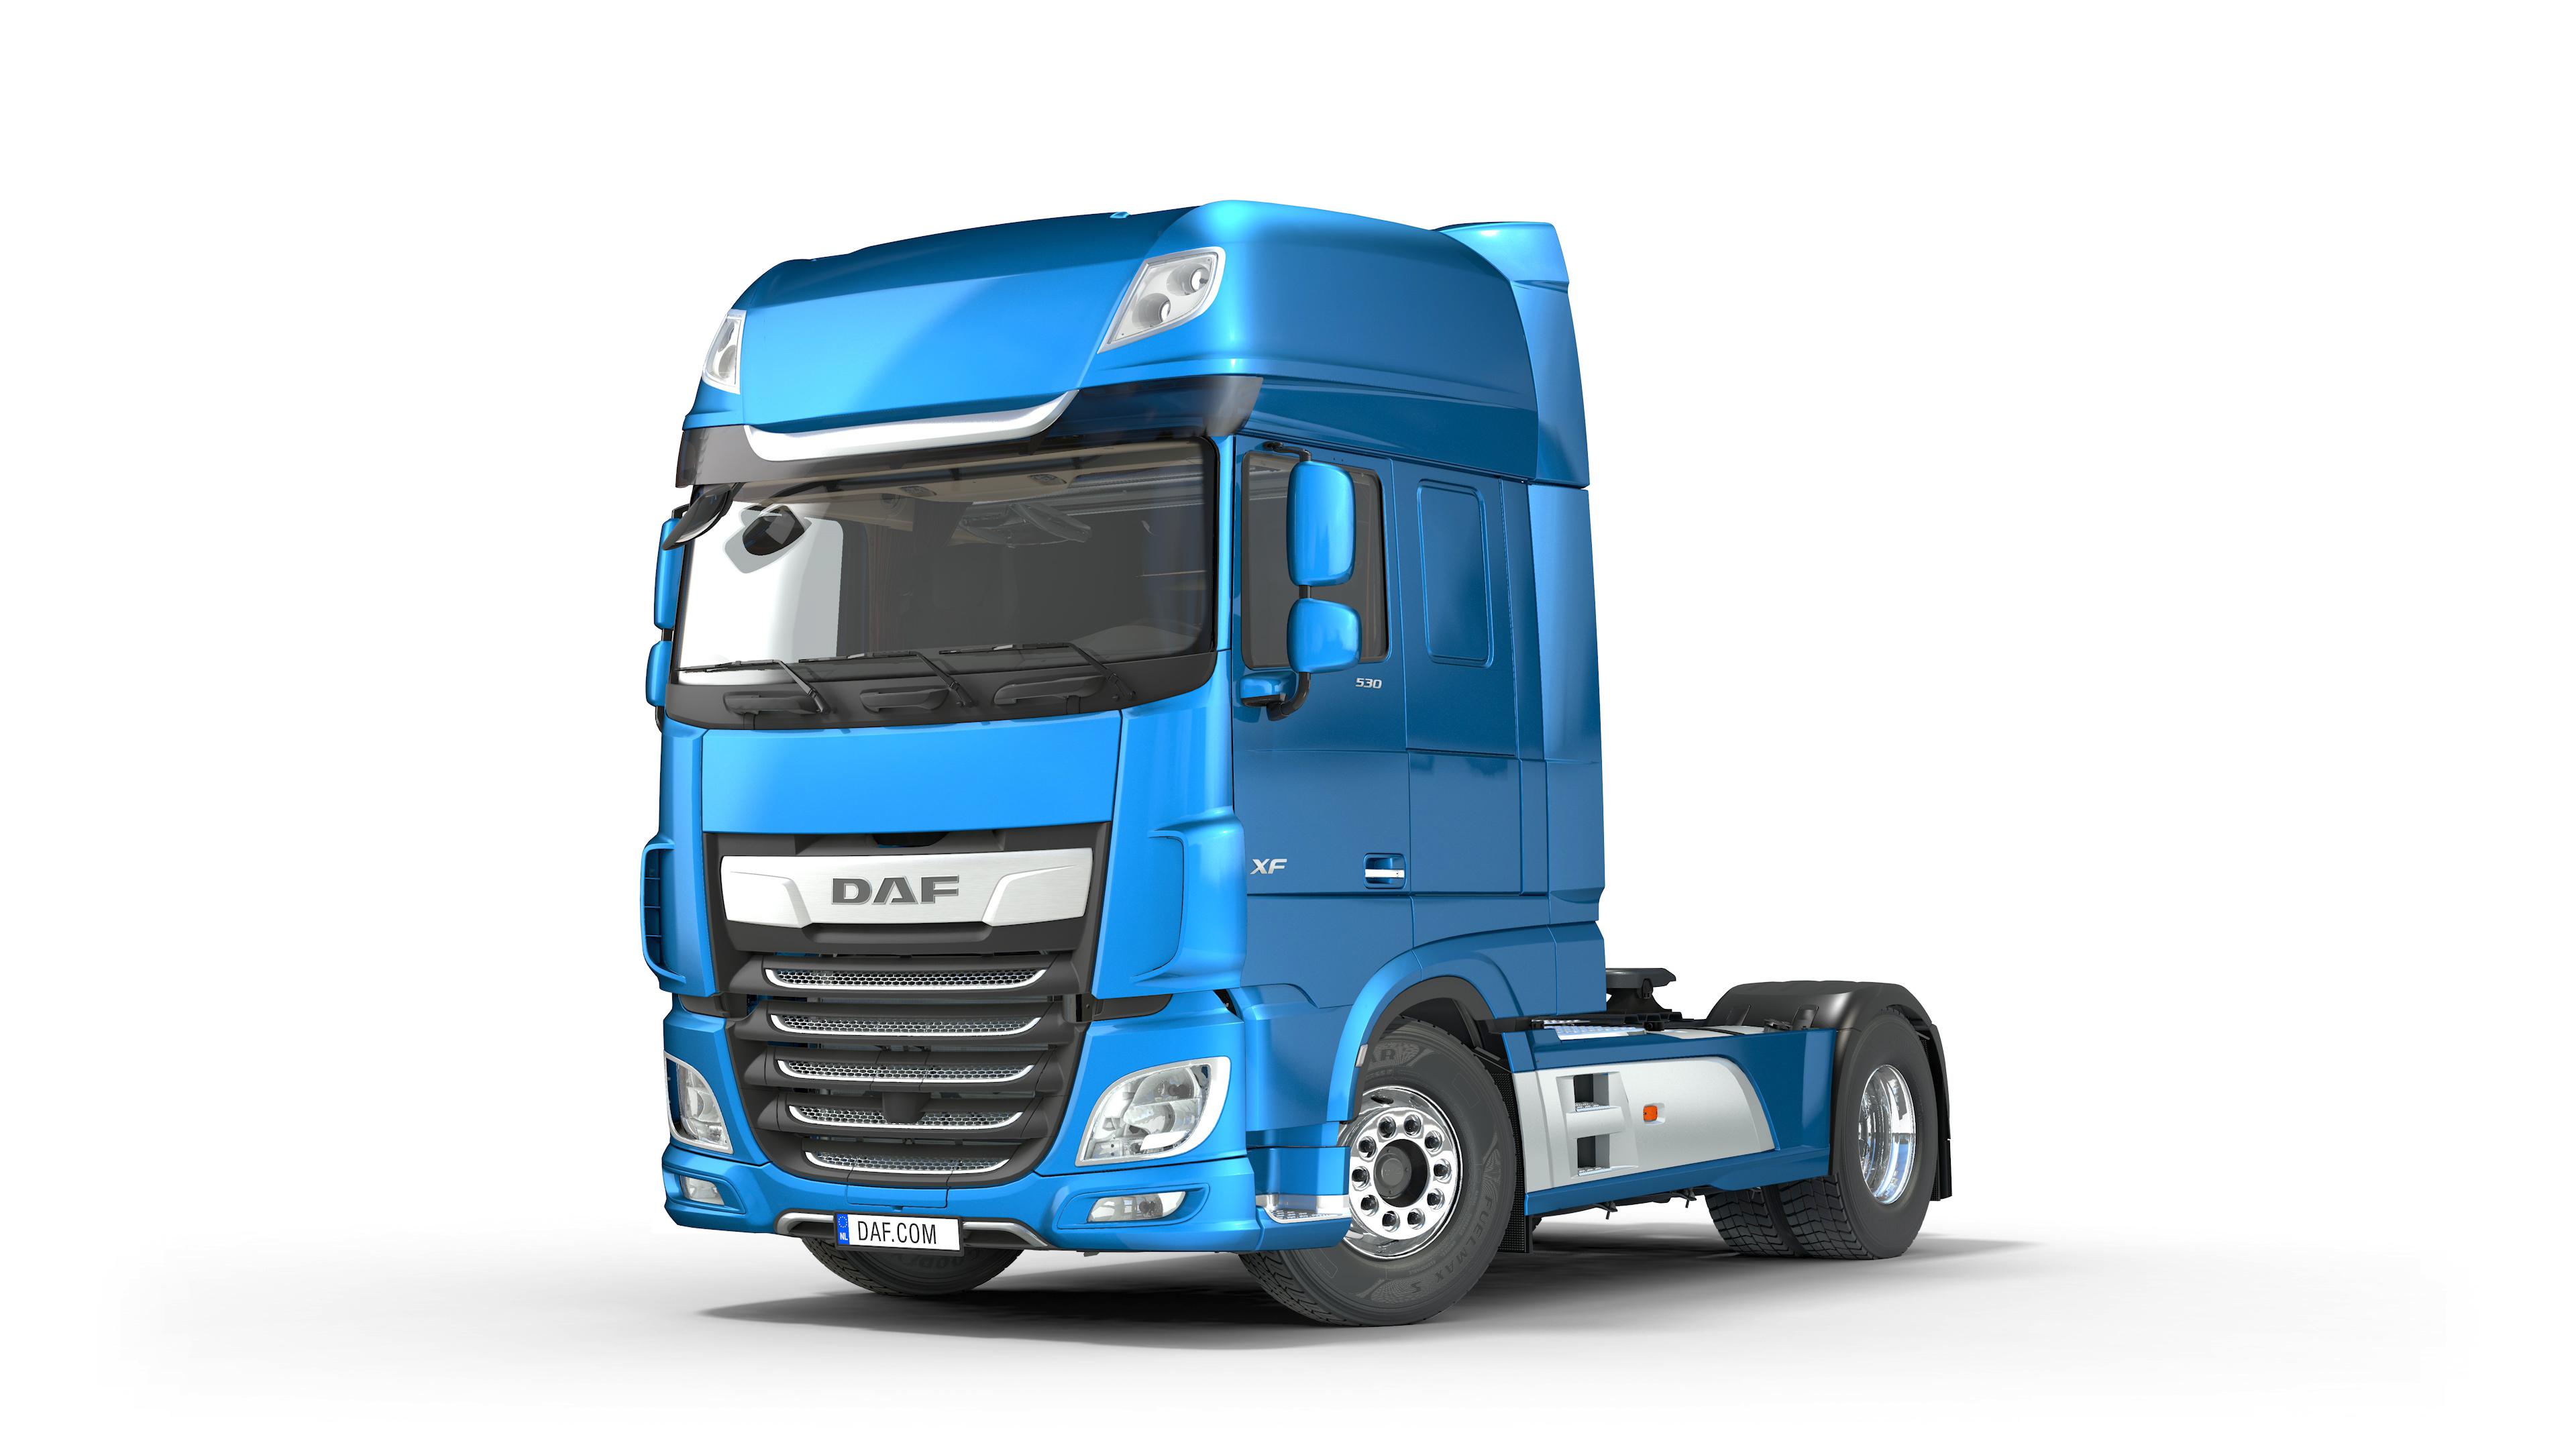 DAF XF SSC Tractor